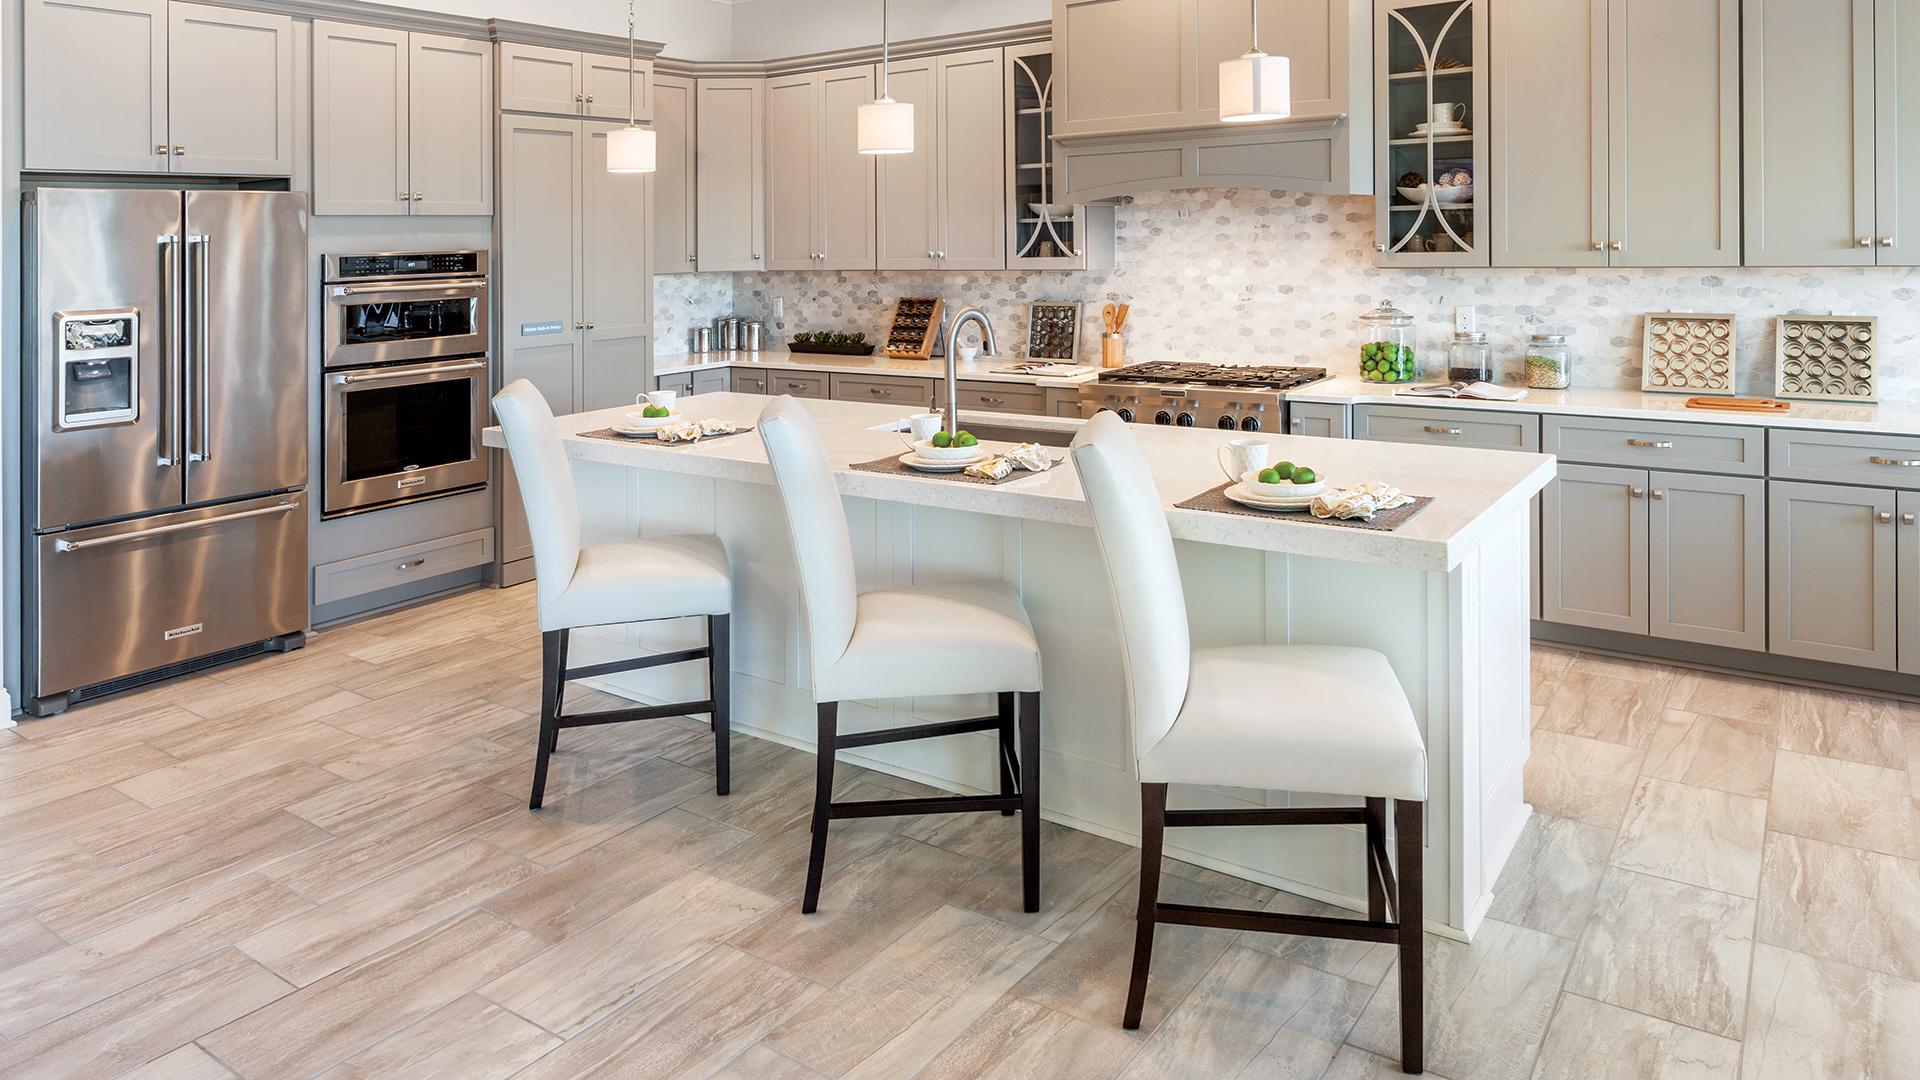 New Luxury Homes For Sale In Palm Beach Gardens Fl Watermark At Avenir